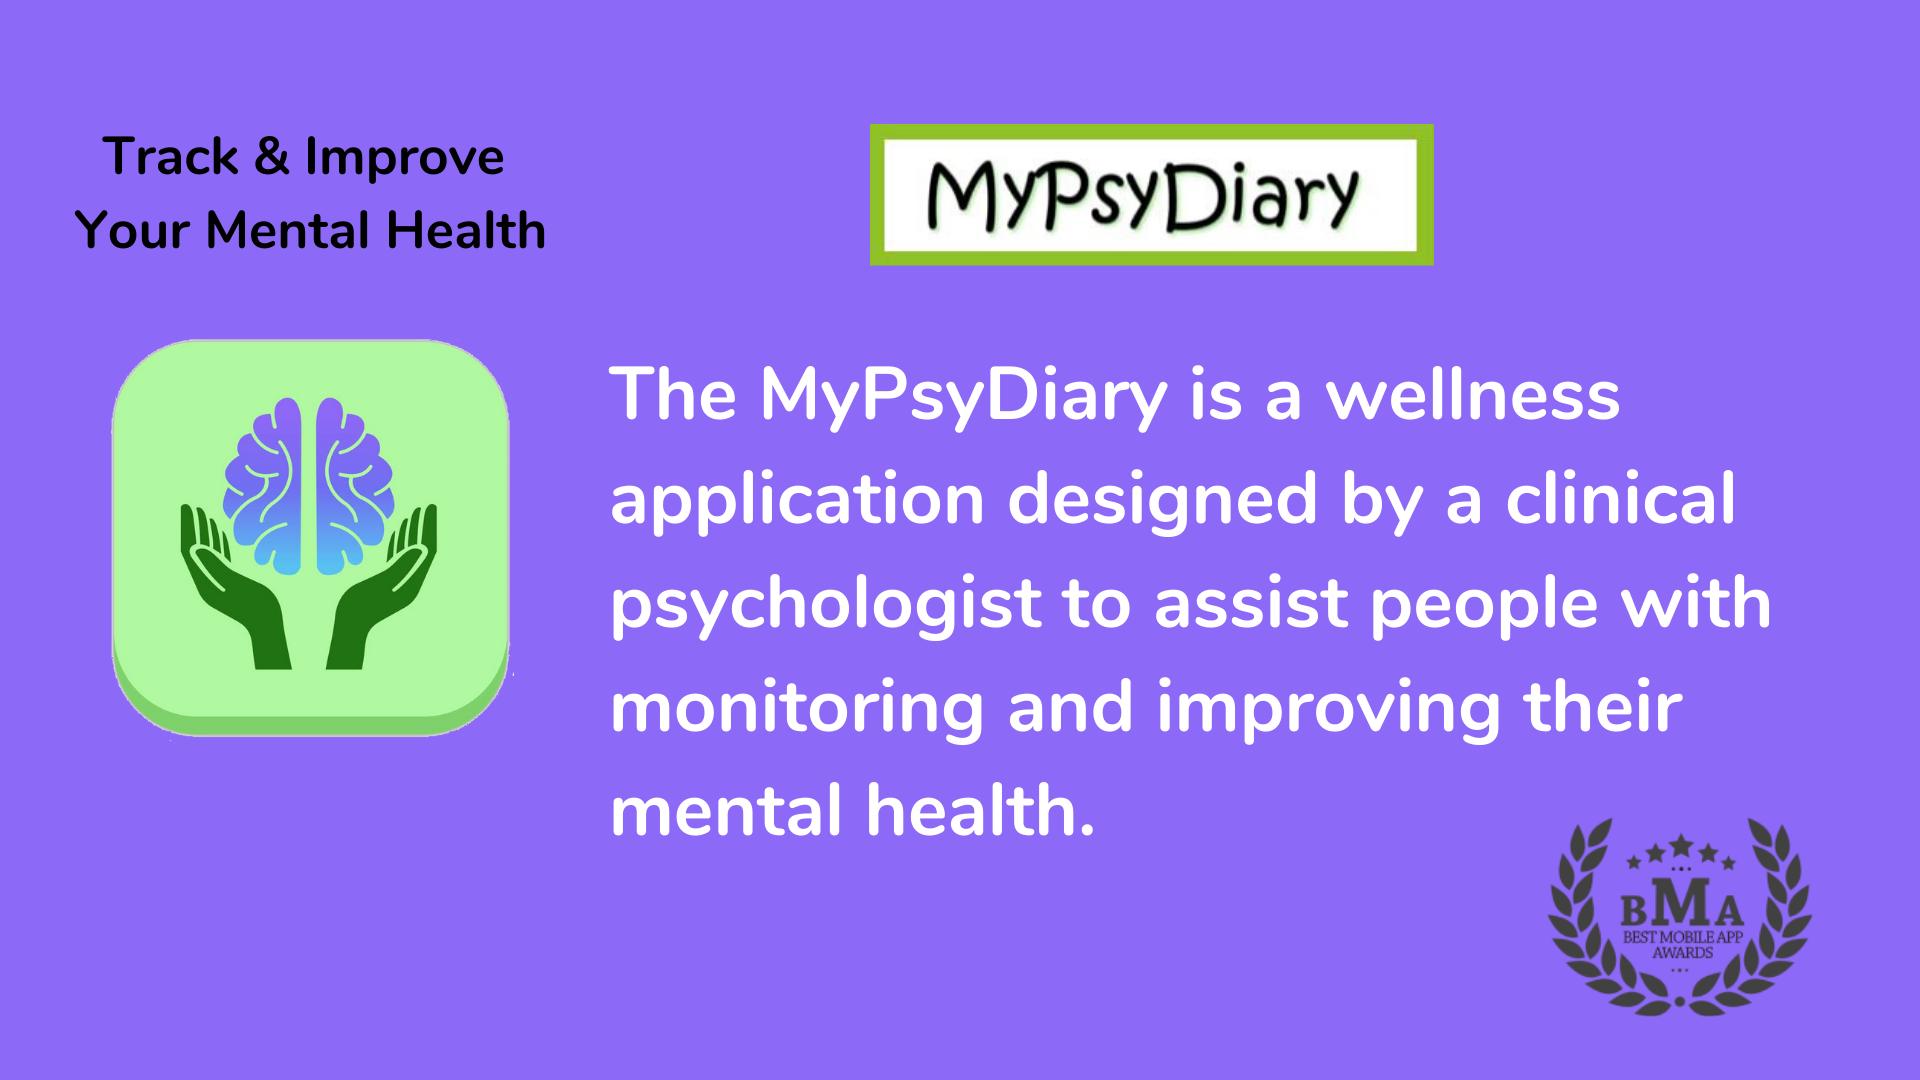 MyPsyDiary: Award Winning Mental Health App!